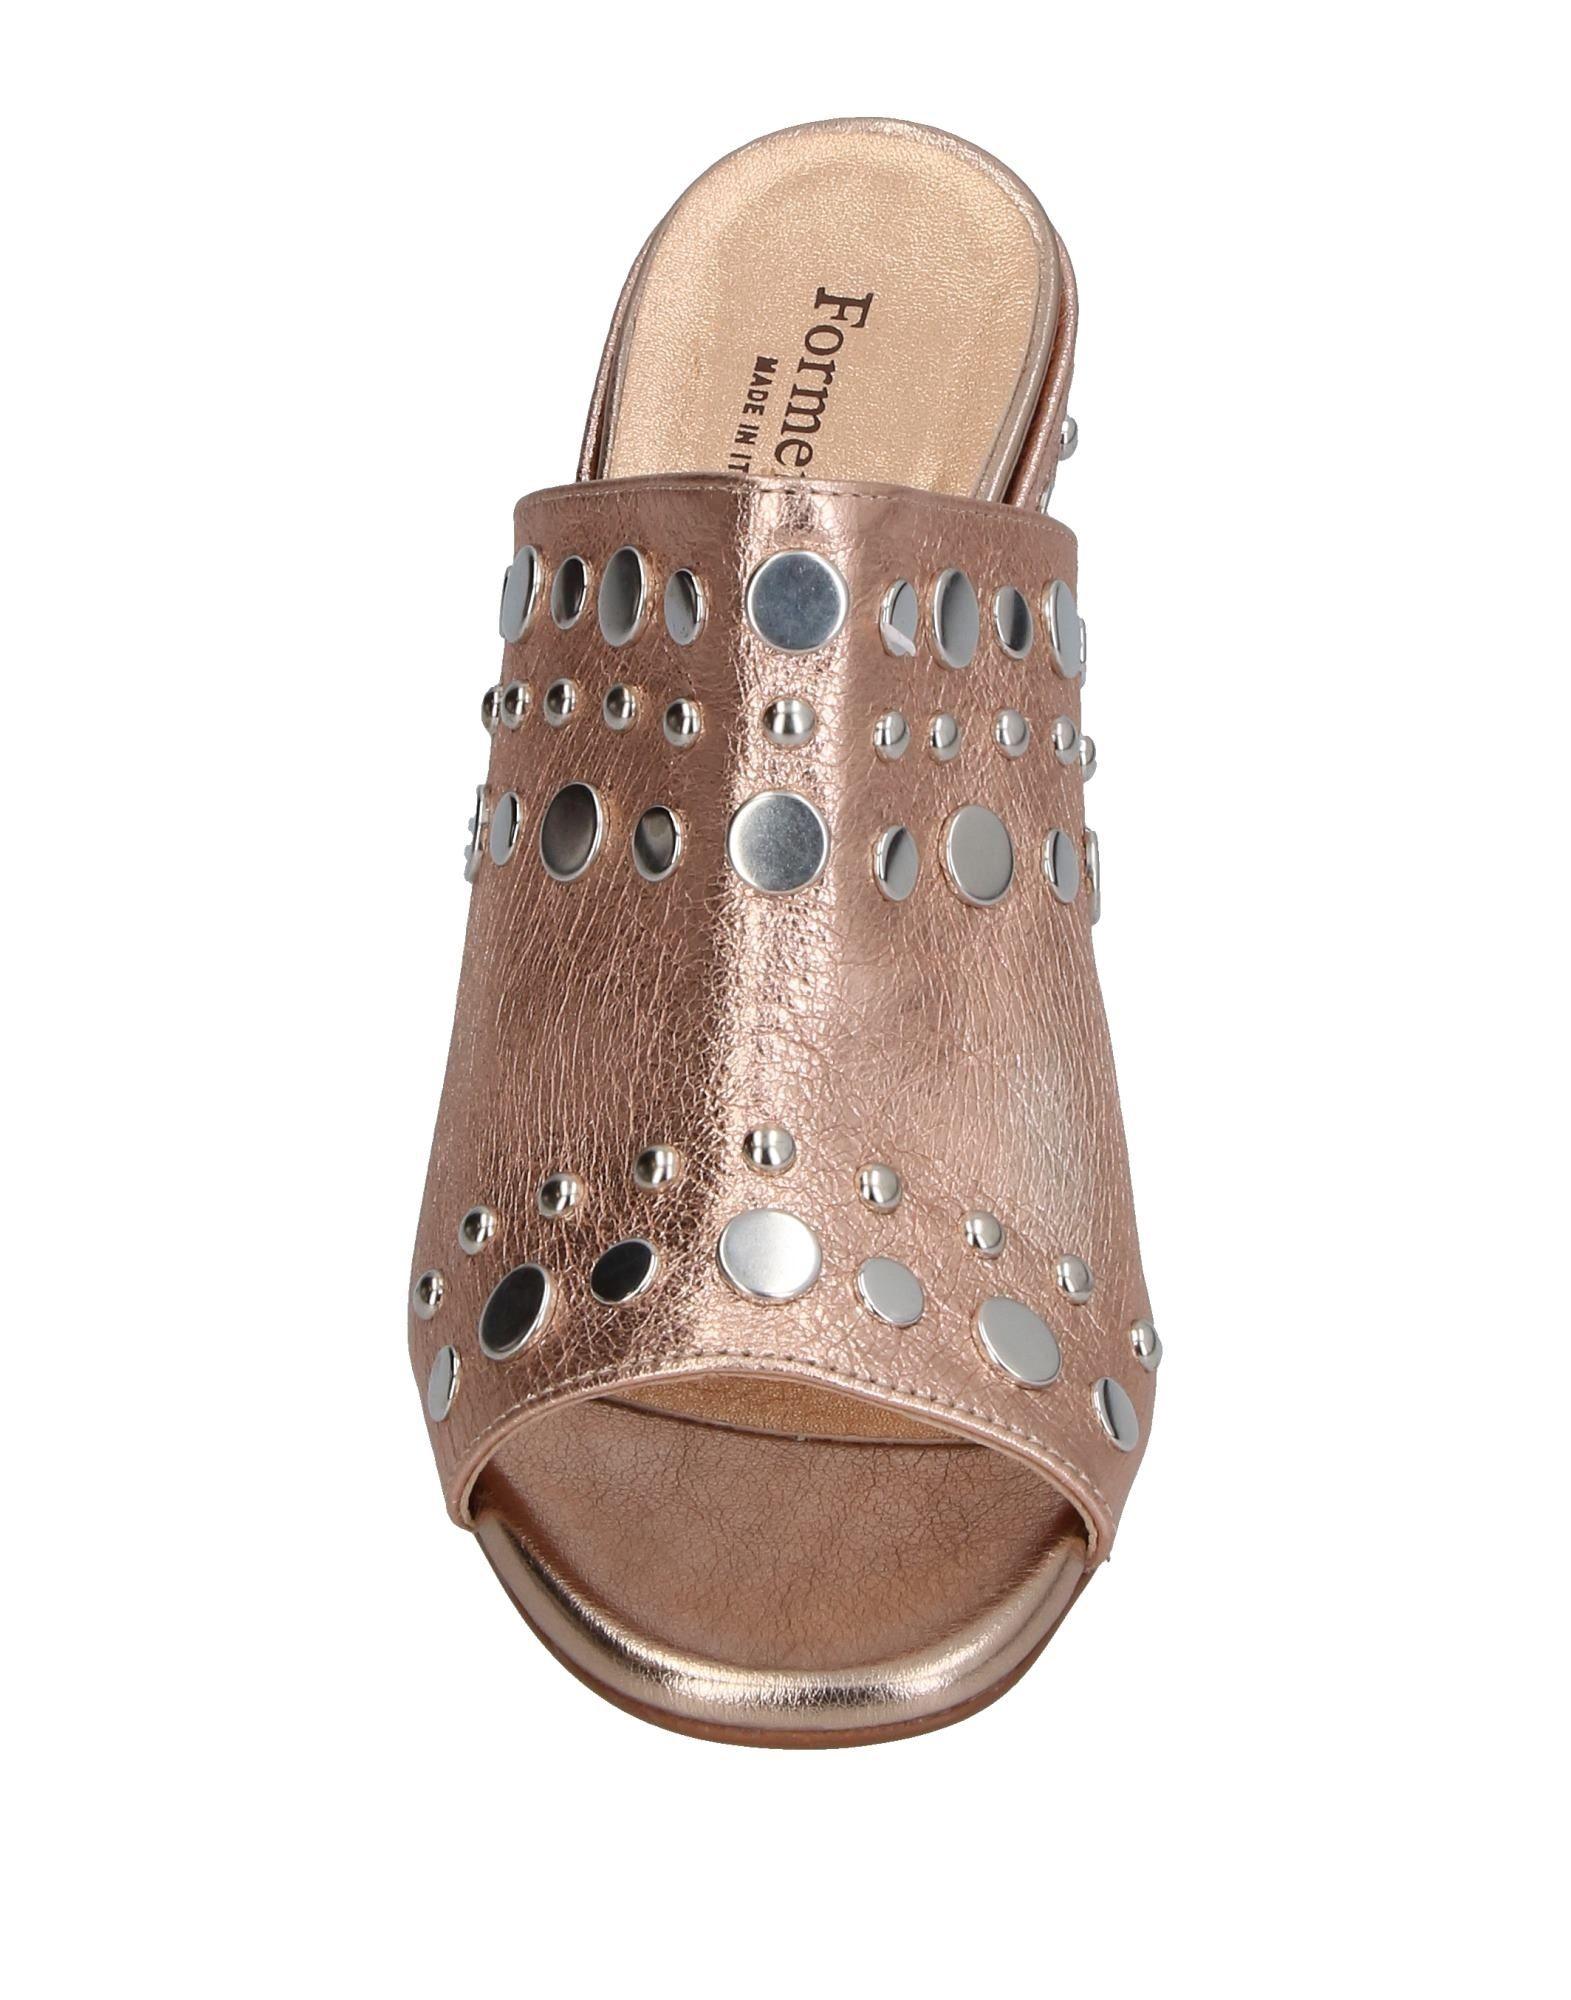 Moda Sandali Formentini Donna - 11375900IK